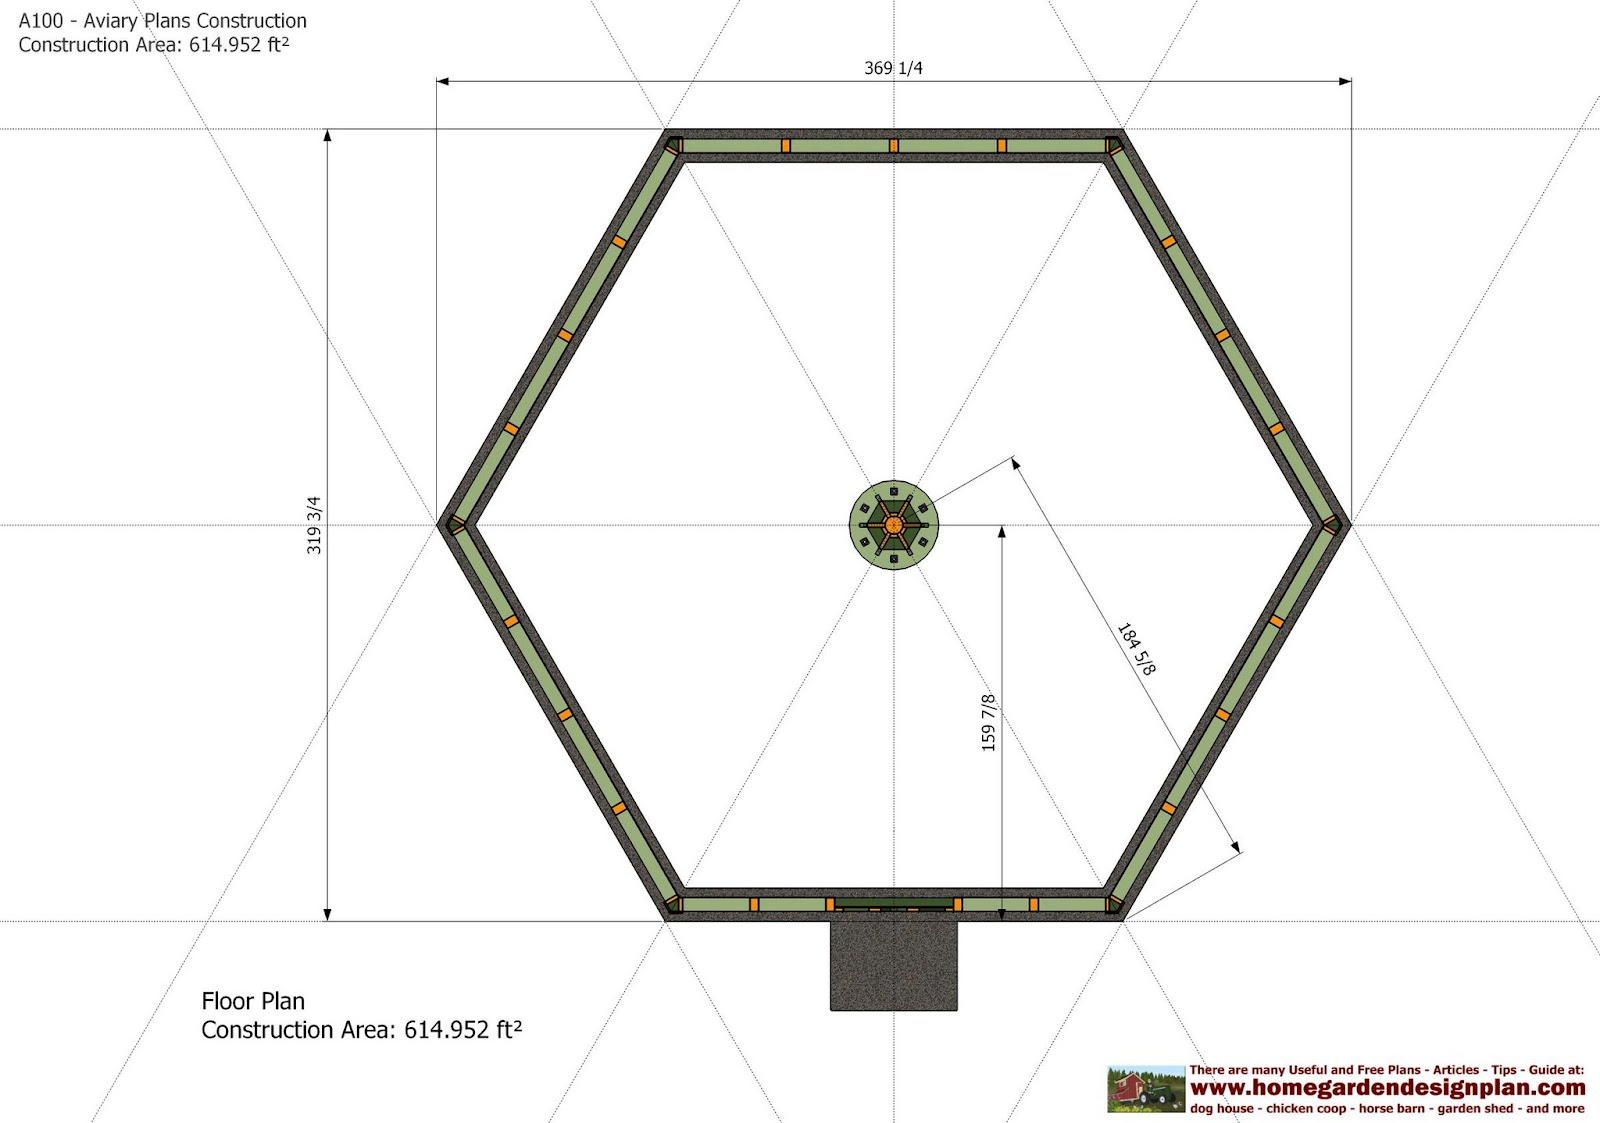 home garden plans: A100 - Aviary Plans Construction - Aviary Design ...